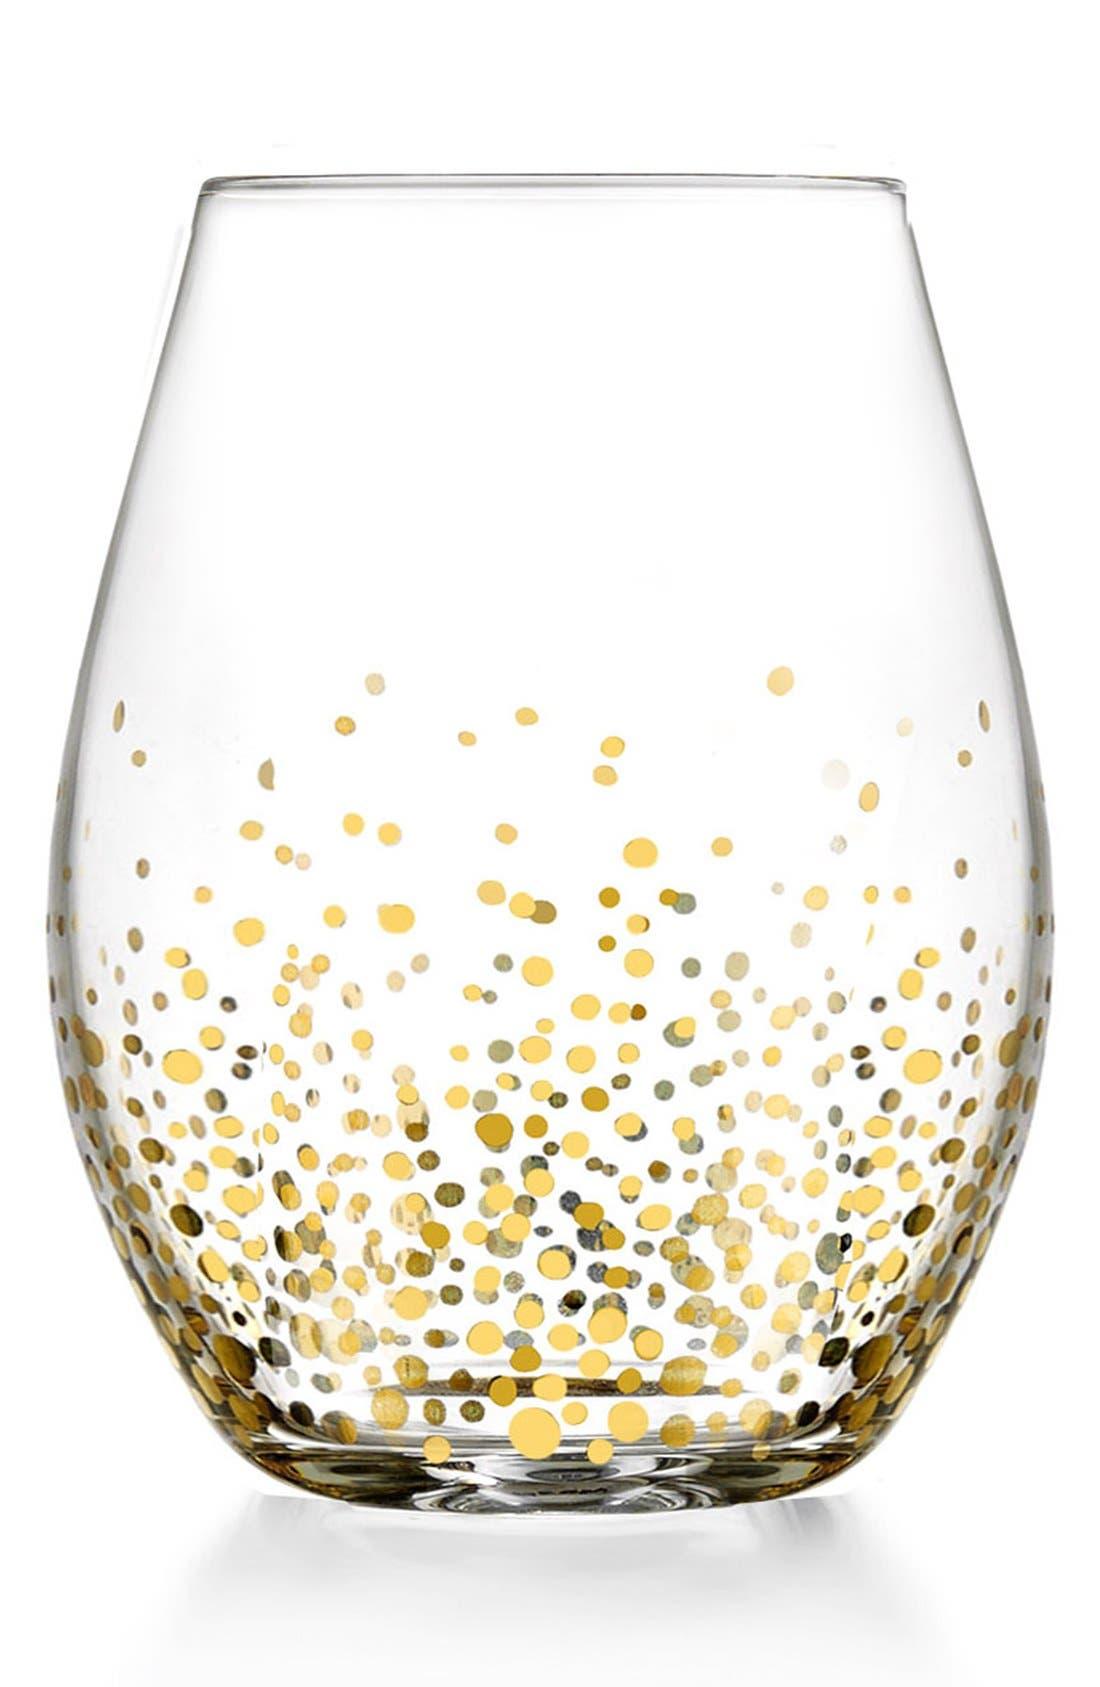 Alternate Image 1 Selected - American Atelier 'Daphne' Stemless Wine Glasses (Set of 4)